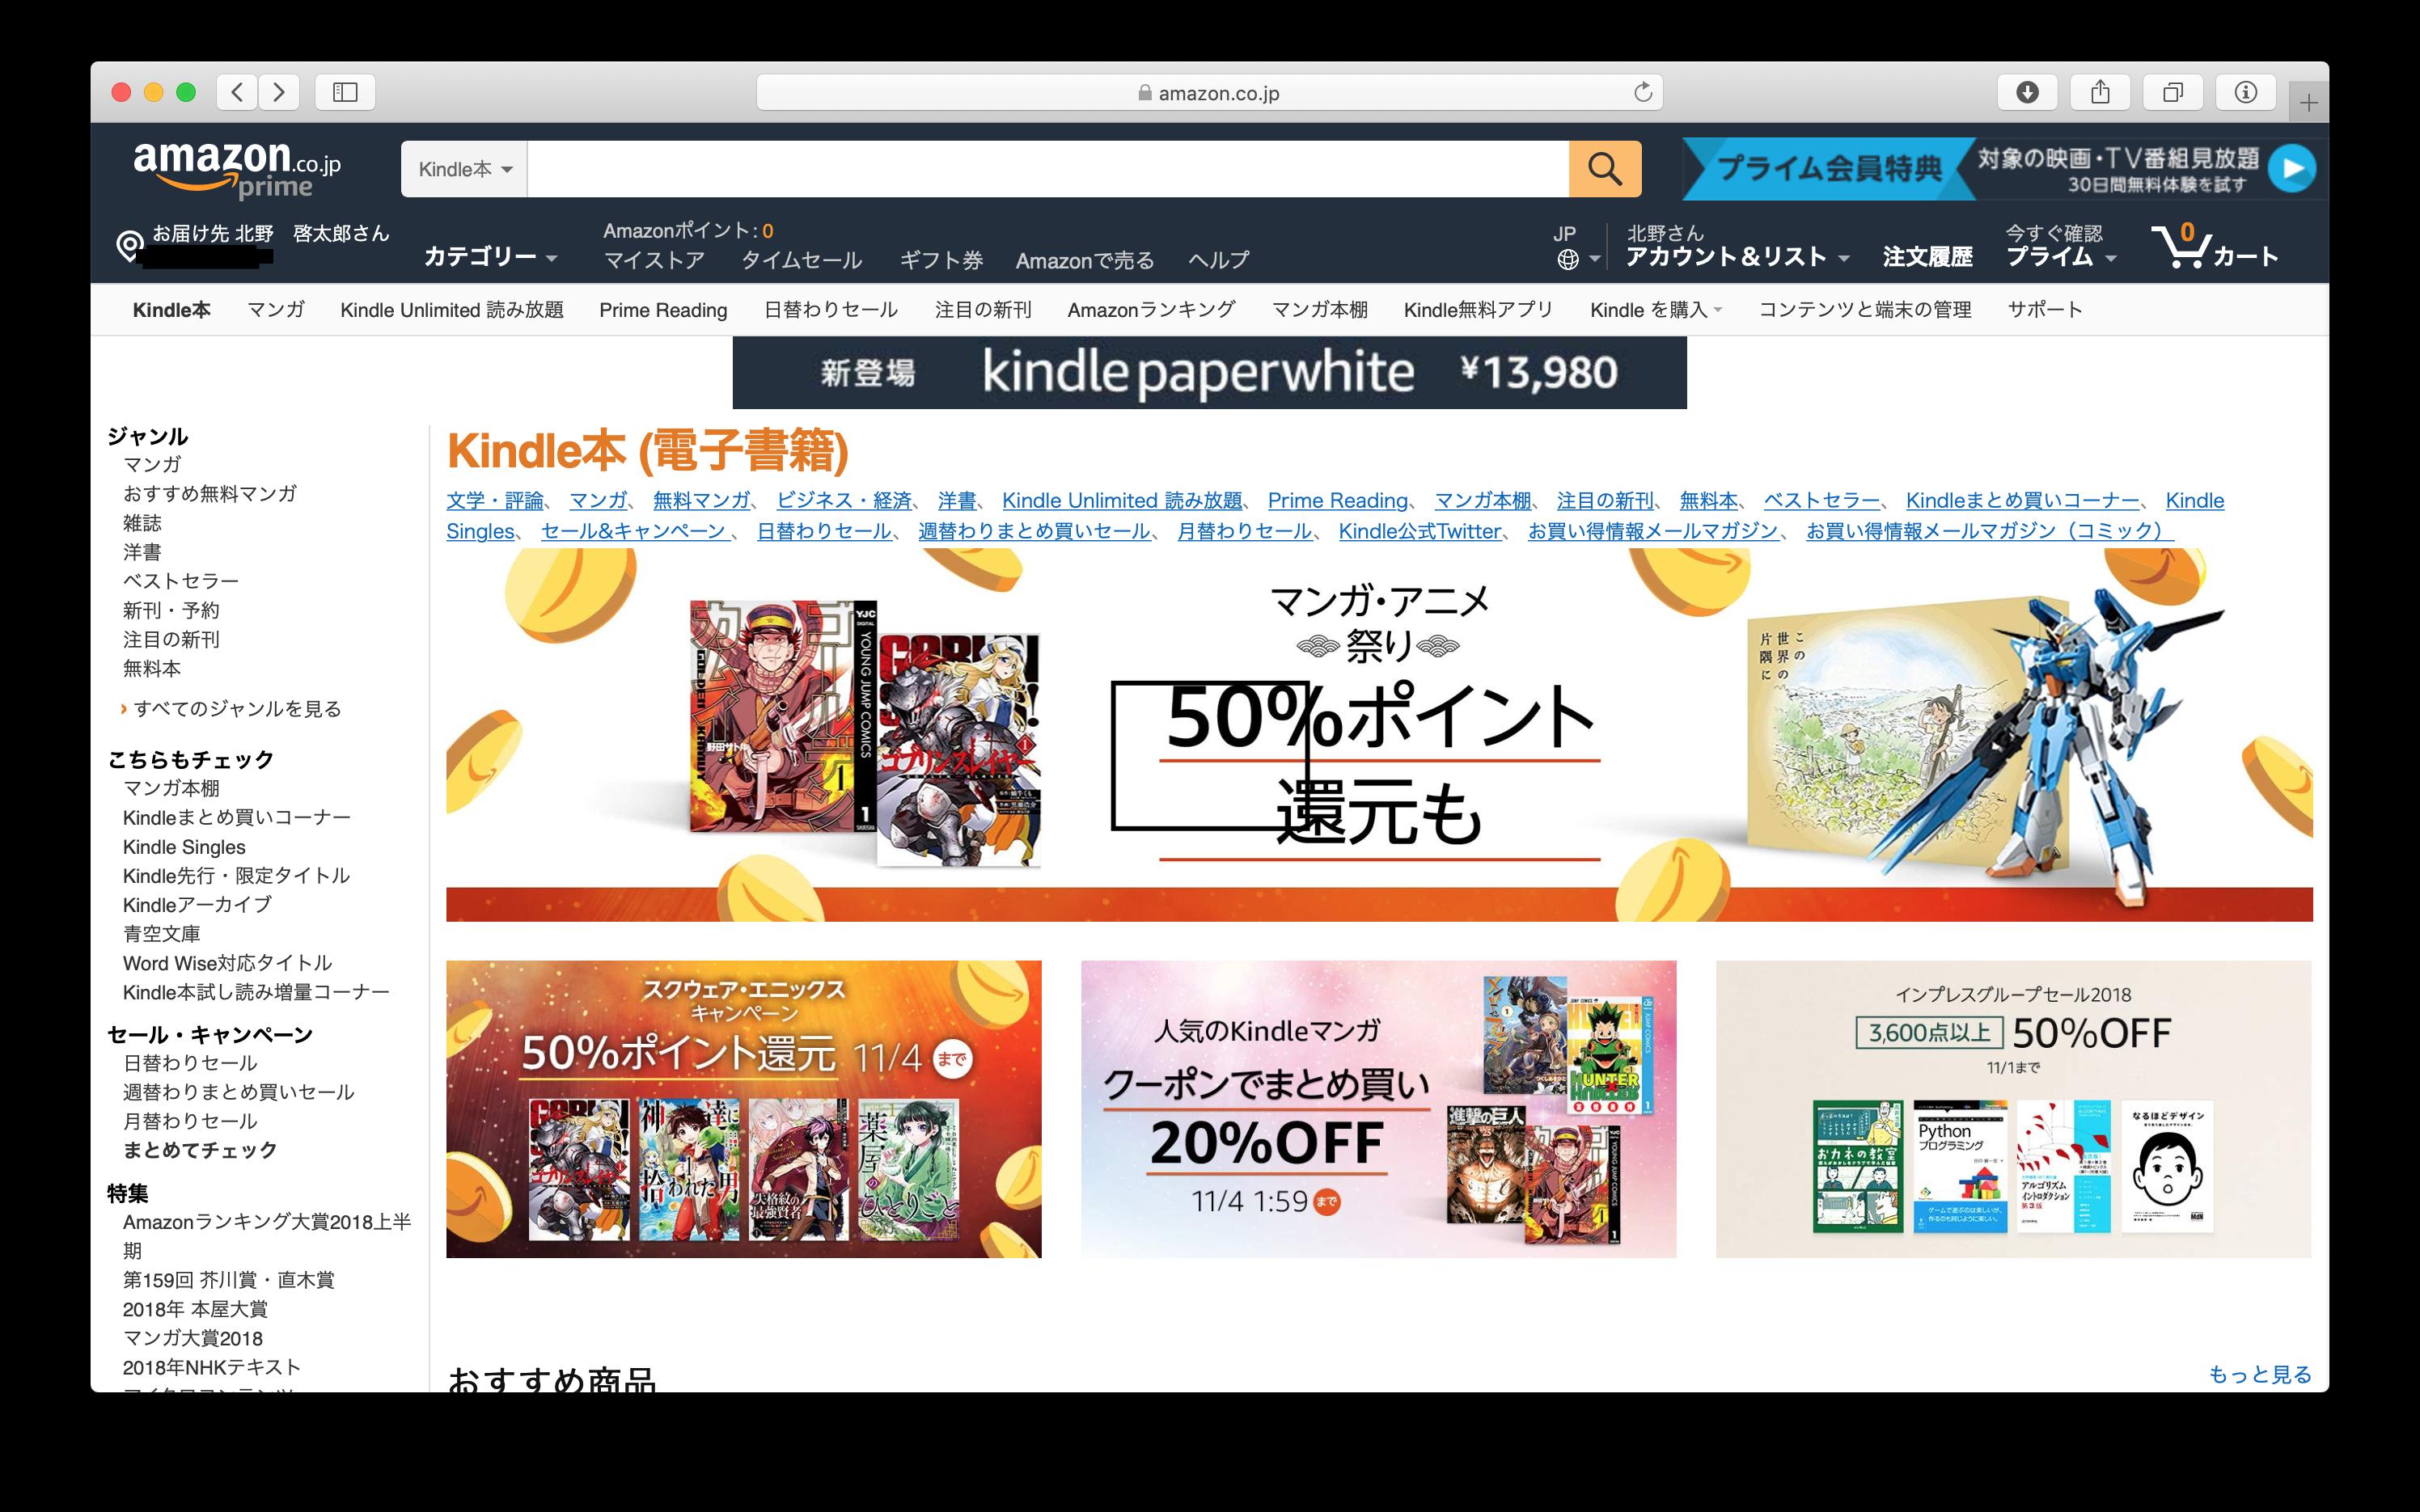 Mac版SafariでAmazon Kindle本ページを開いているところ